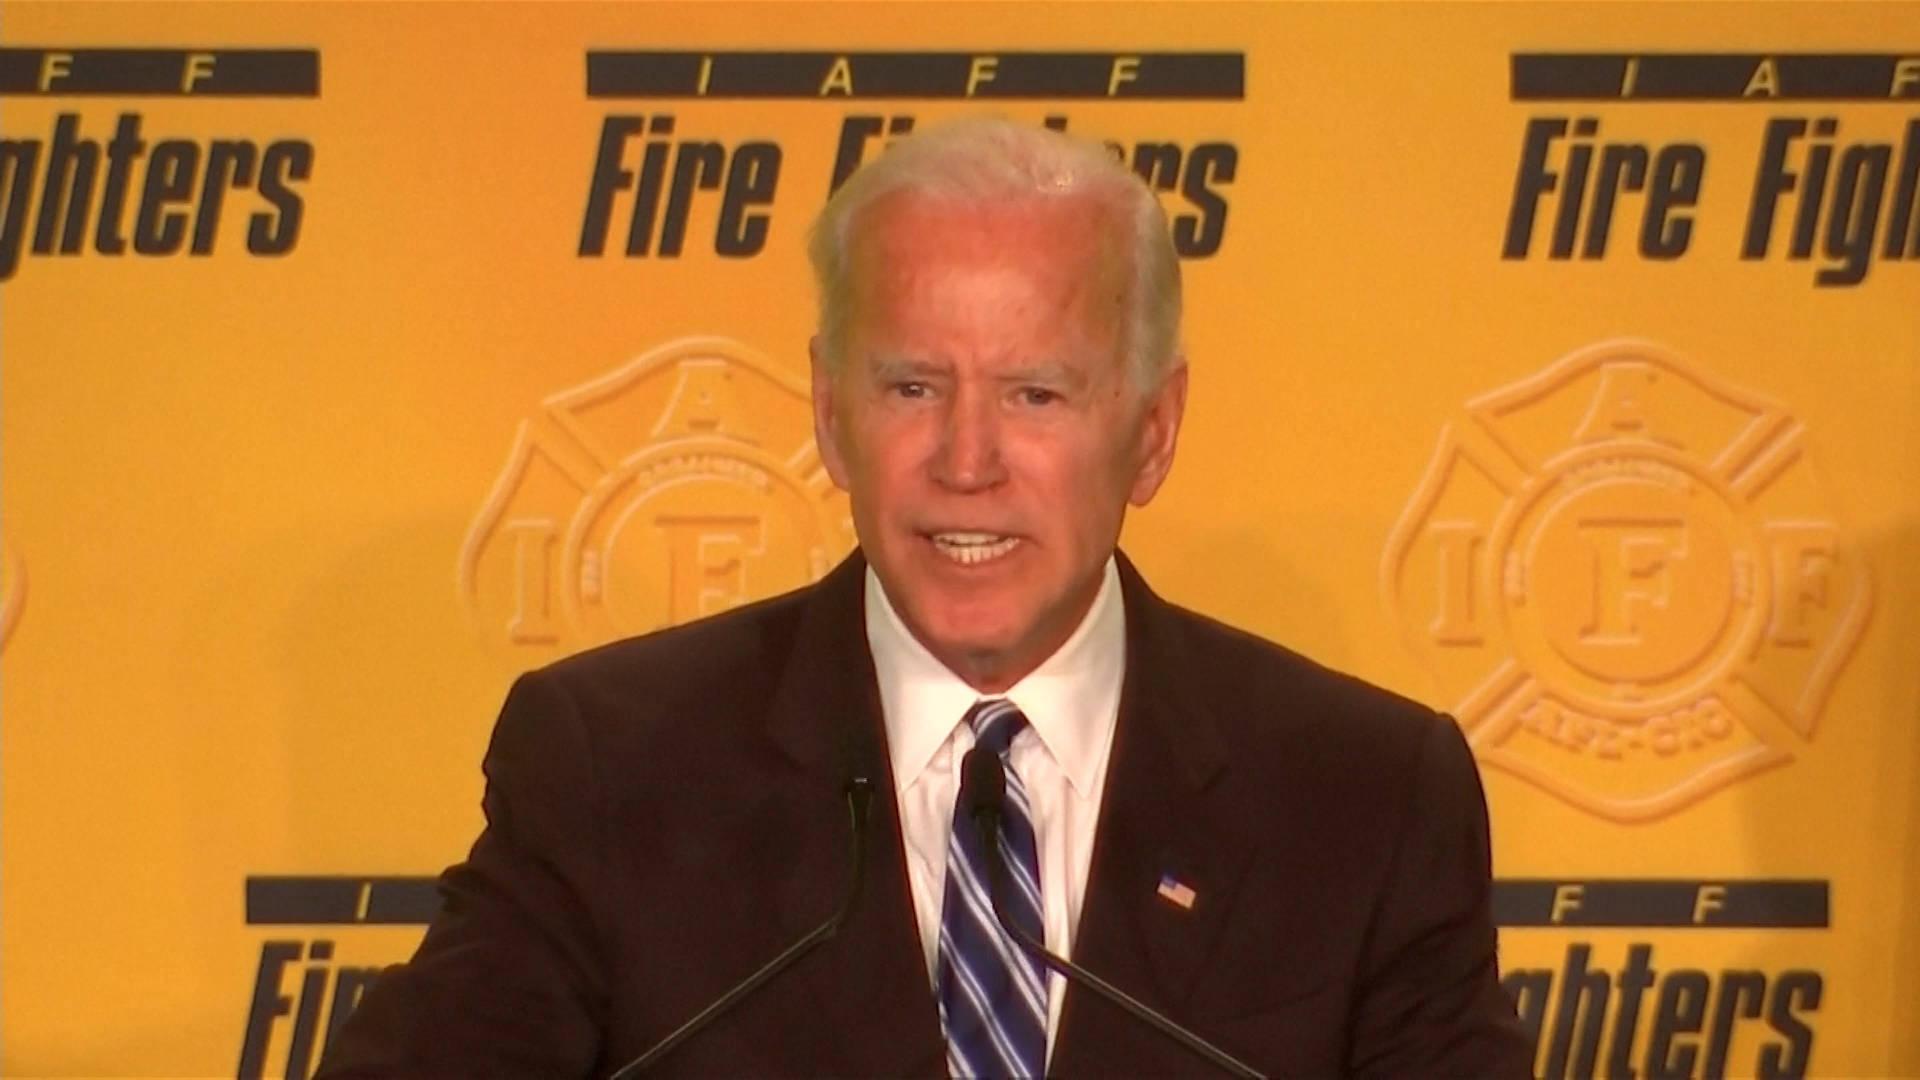 The Case Against Joe Biden: How the Former VP Fueled Mass